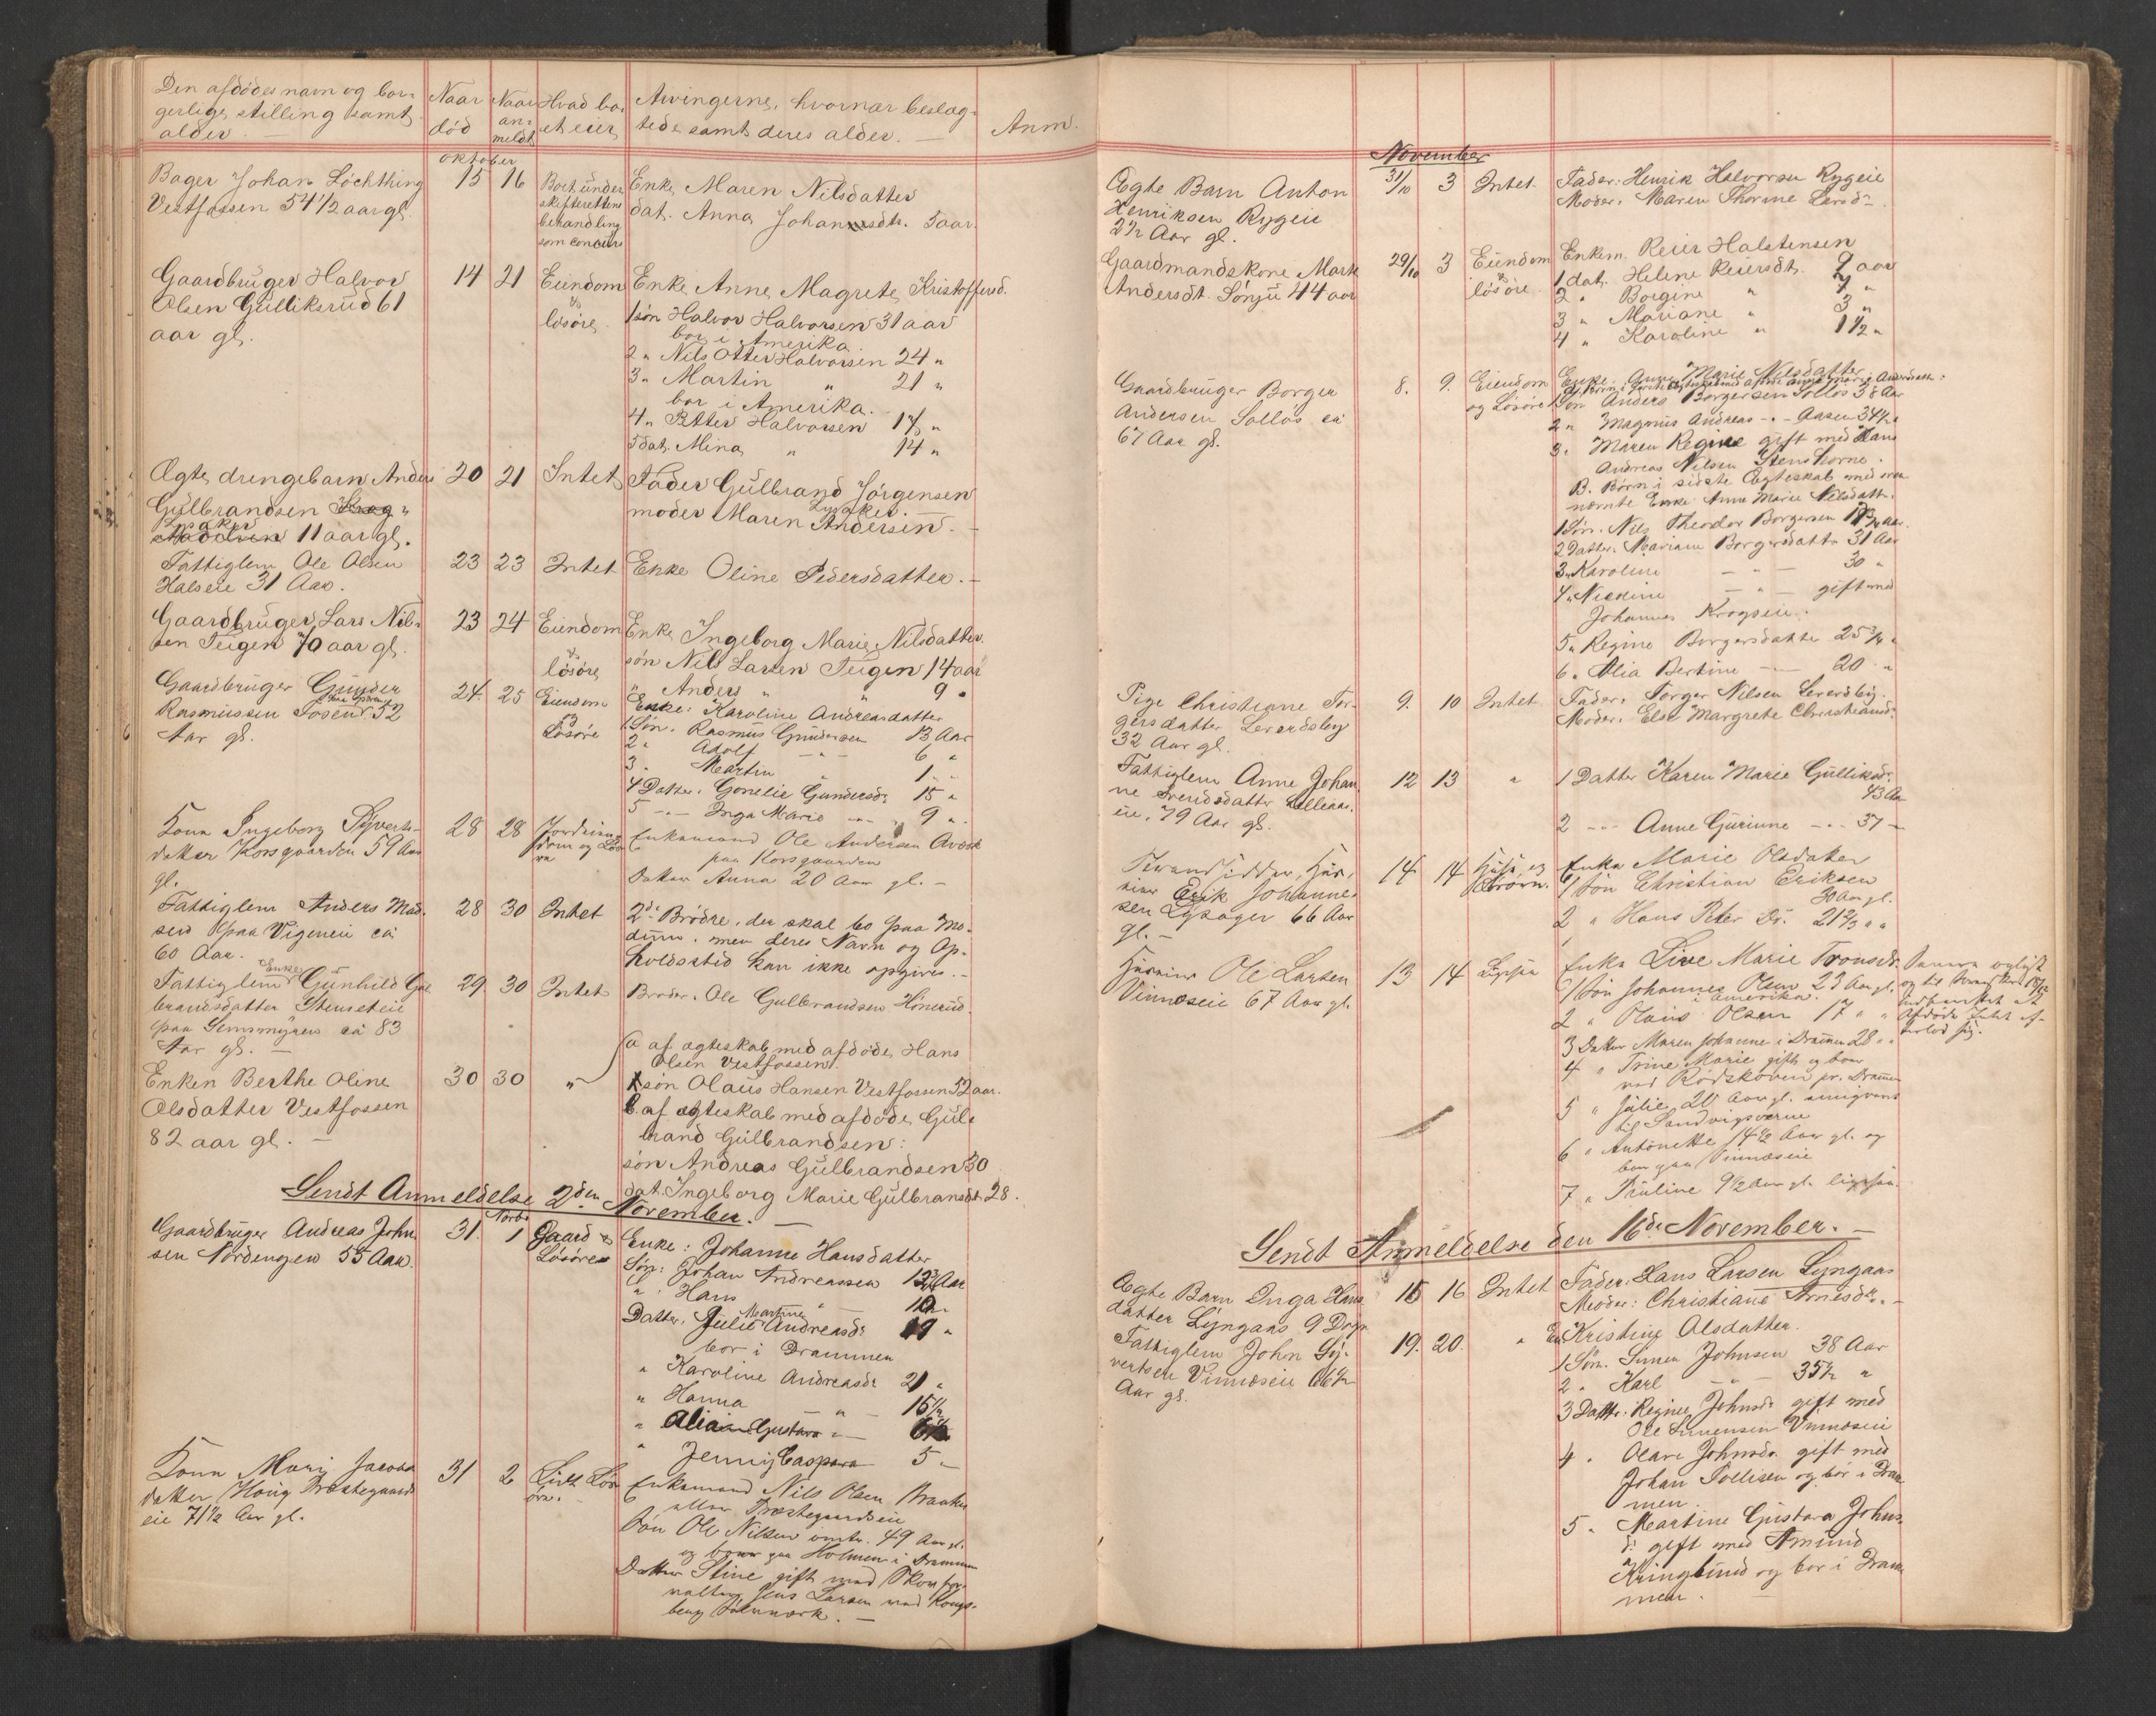 SAKO, Eiker lensmannskontor, H/Ha/L0003: Dødsfallsprotokoll, 1879-1894